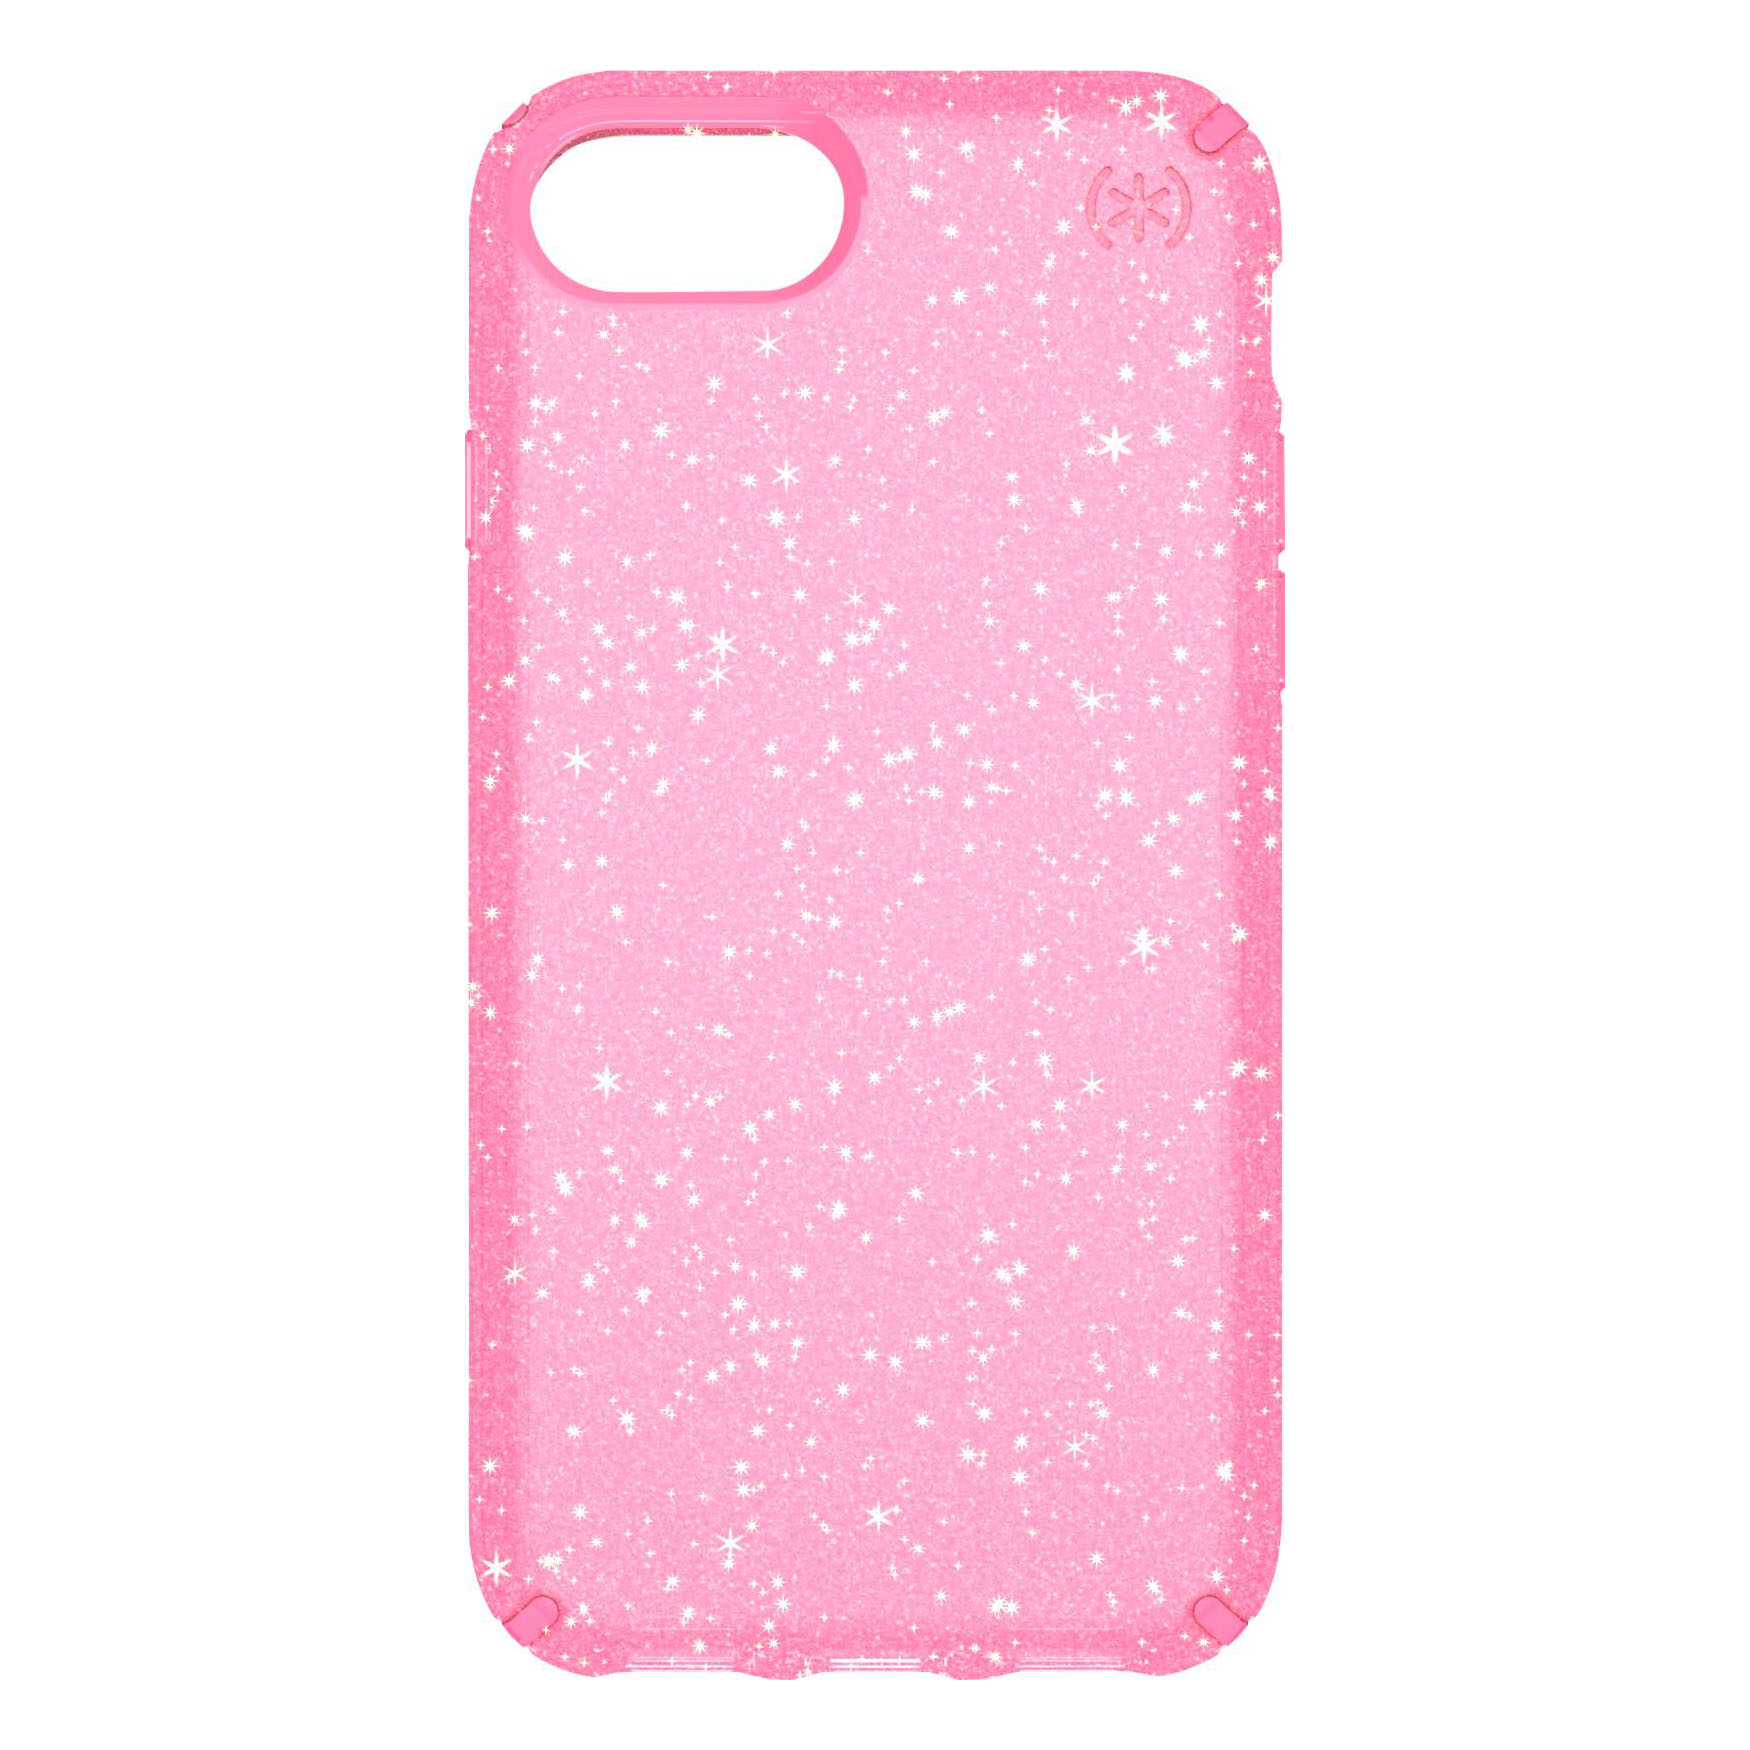 Speck Presidio Clear Glitter Case for iPhone 8/7/6 - Bella Pink/Gold Glitter